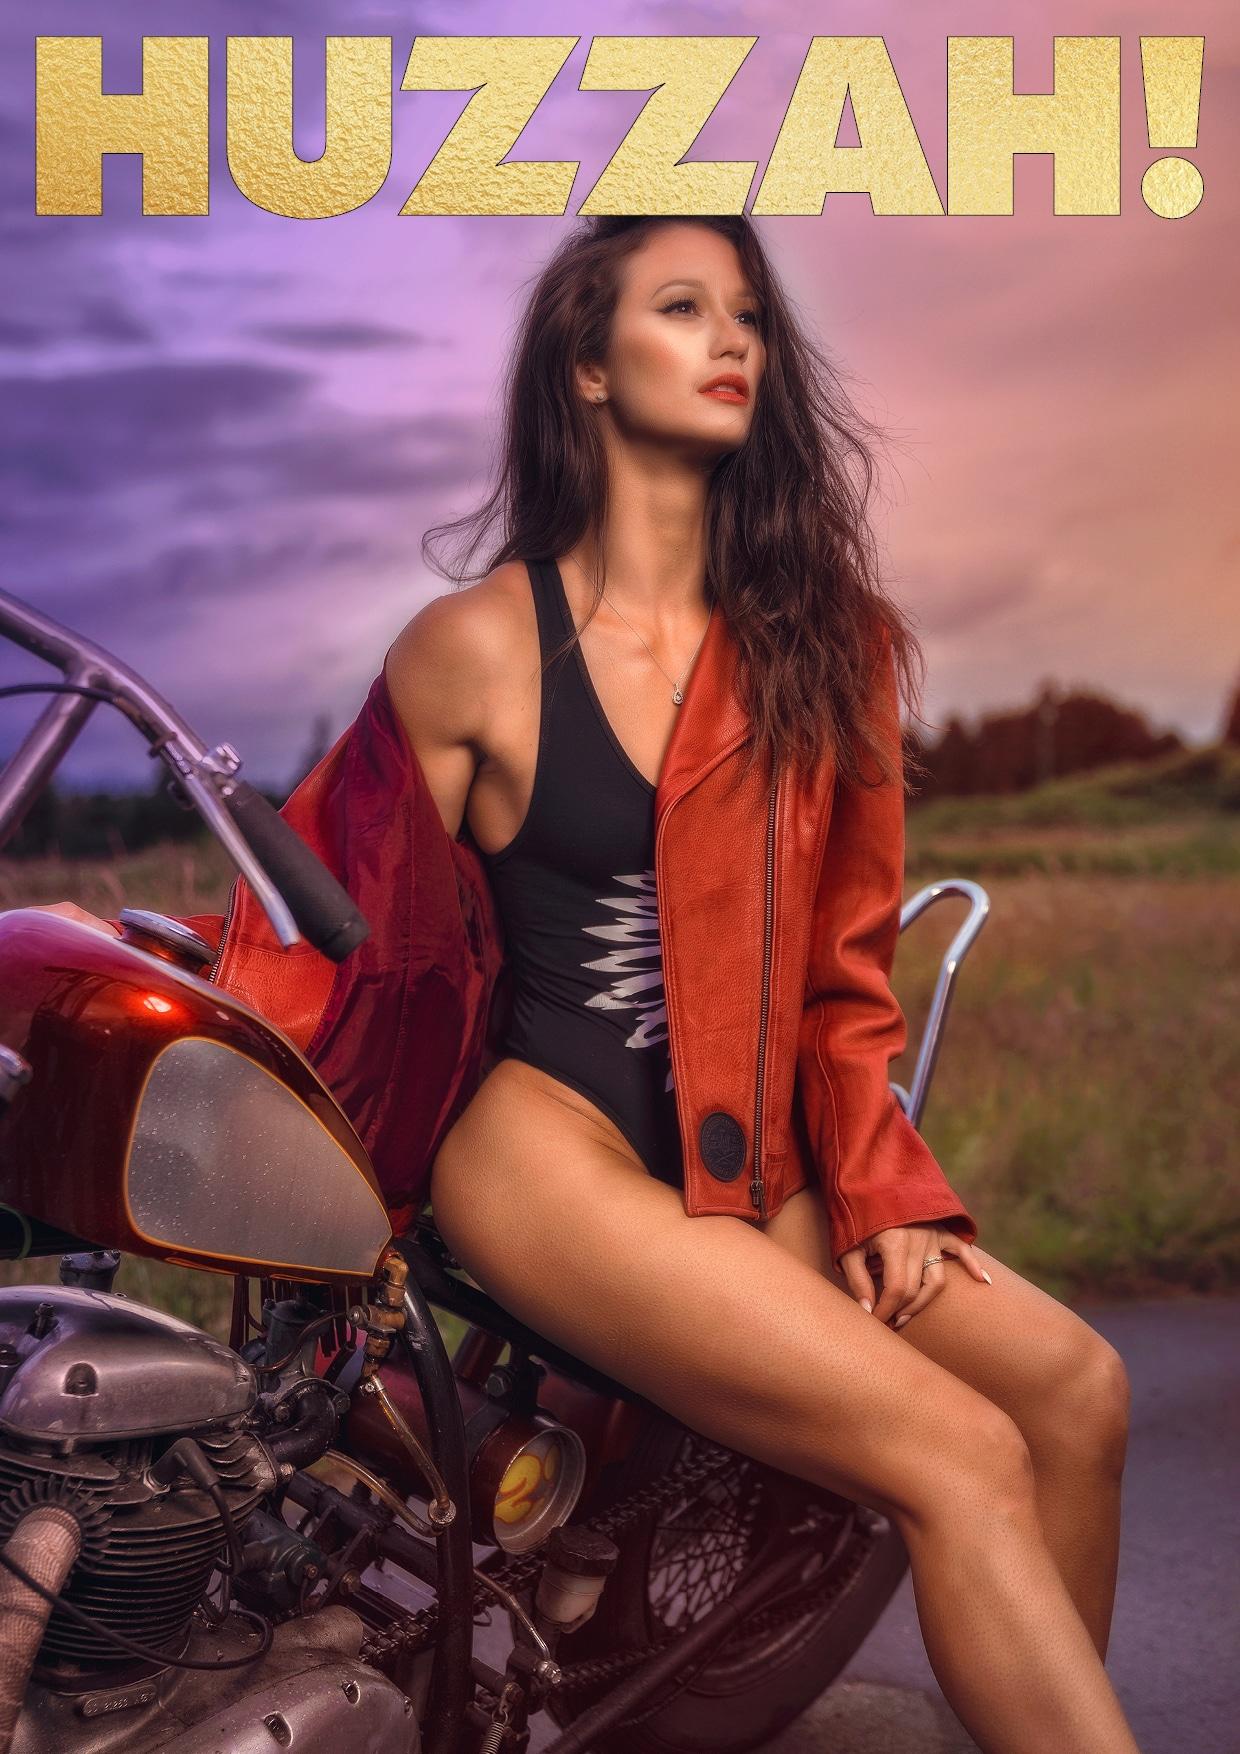 HUZZAH! Magazine - September 2020 - Ashley Young